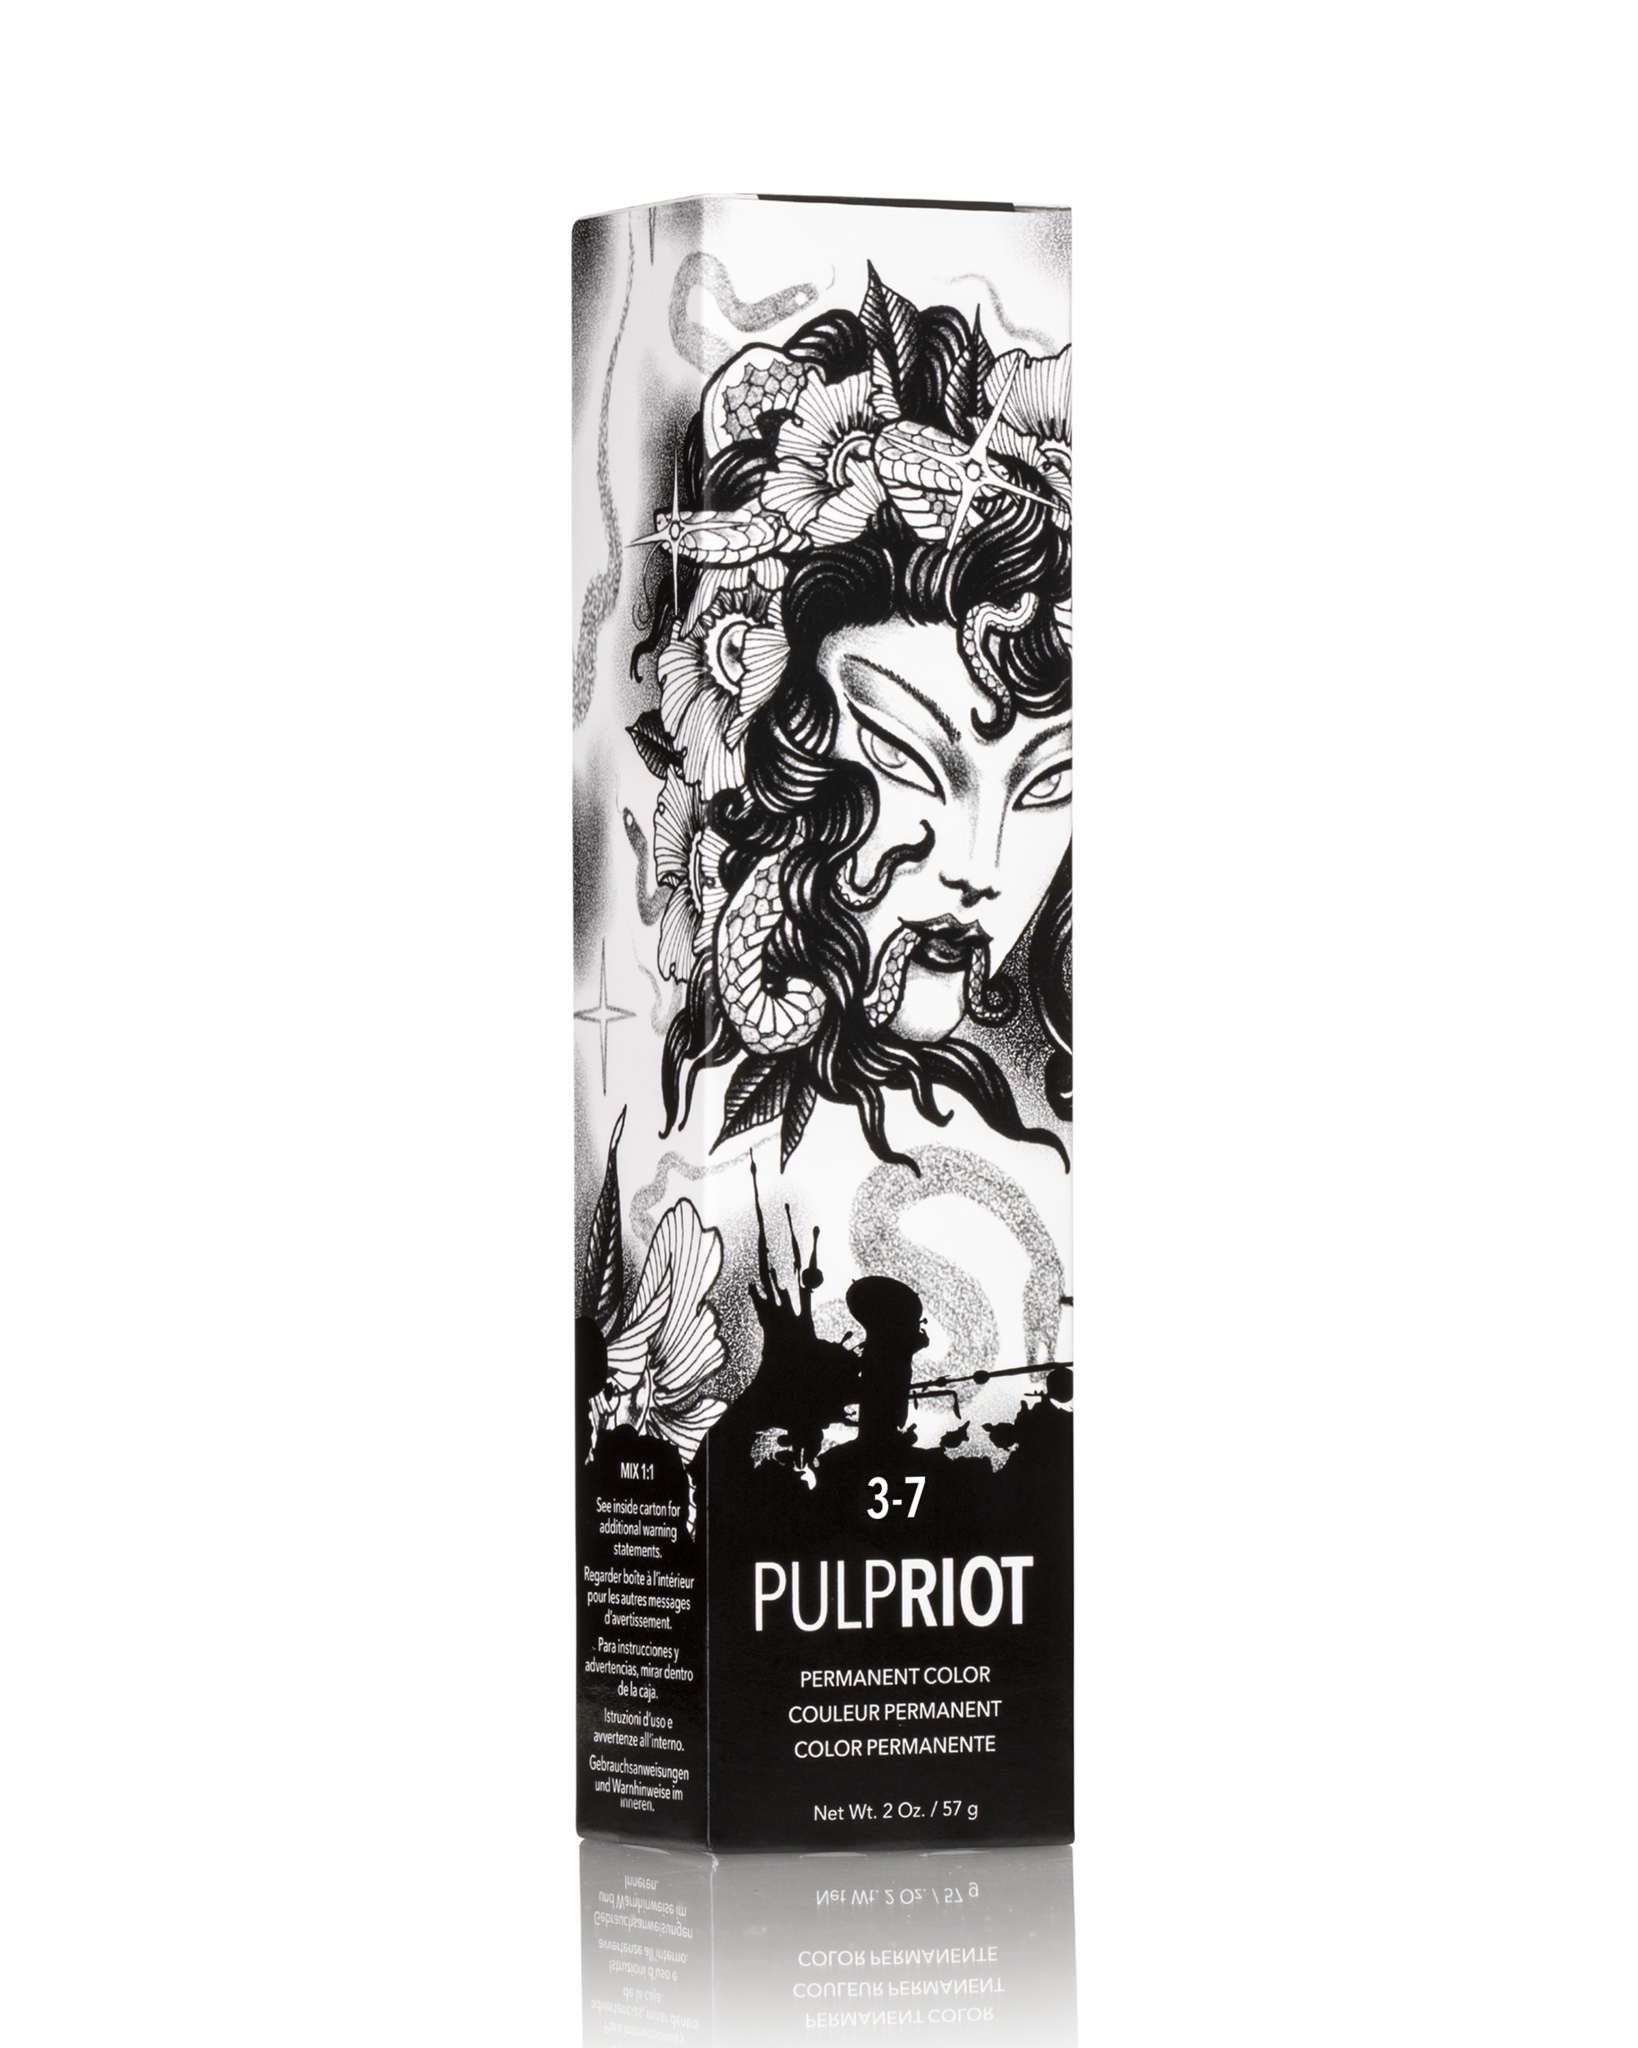 Pulp Riot PULP RIOT FACTION 8 MATE 3-7